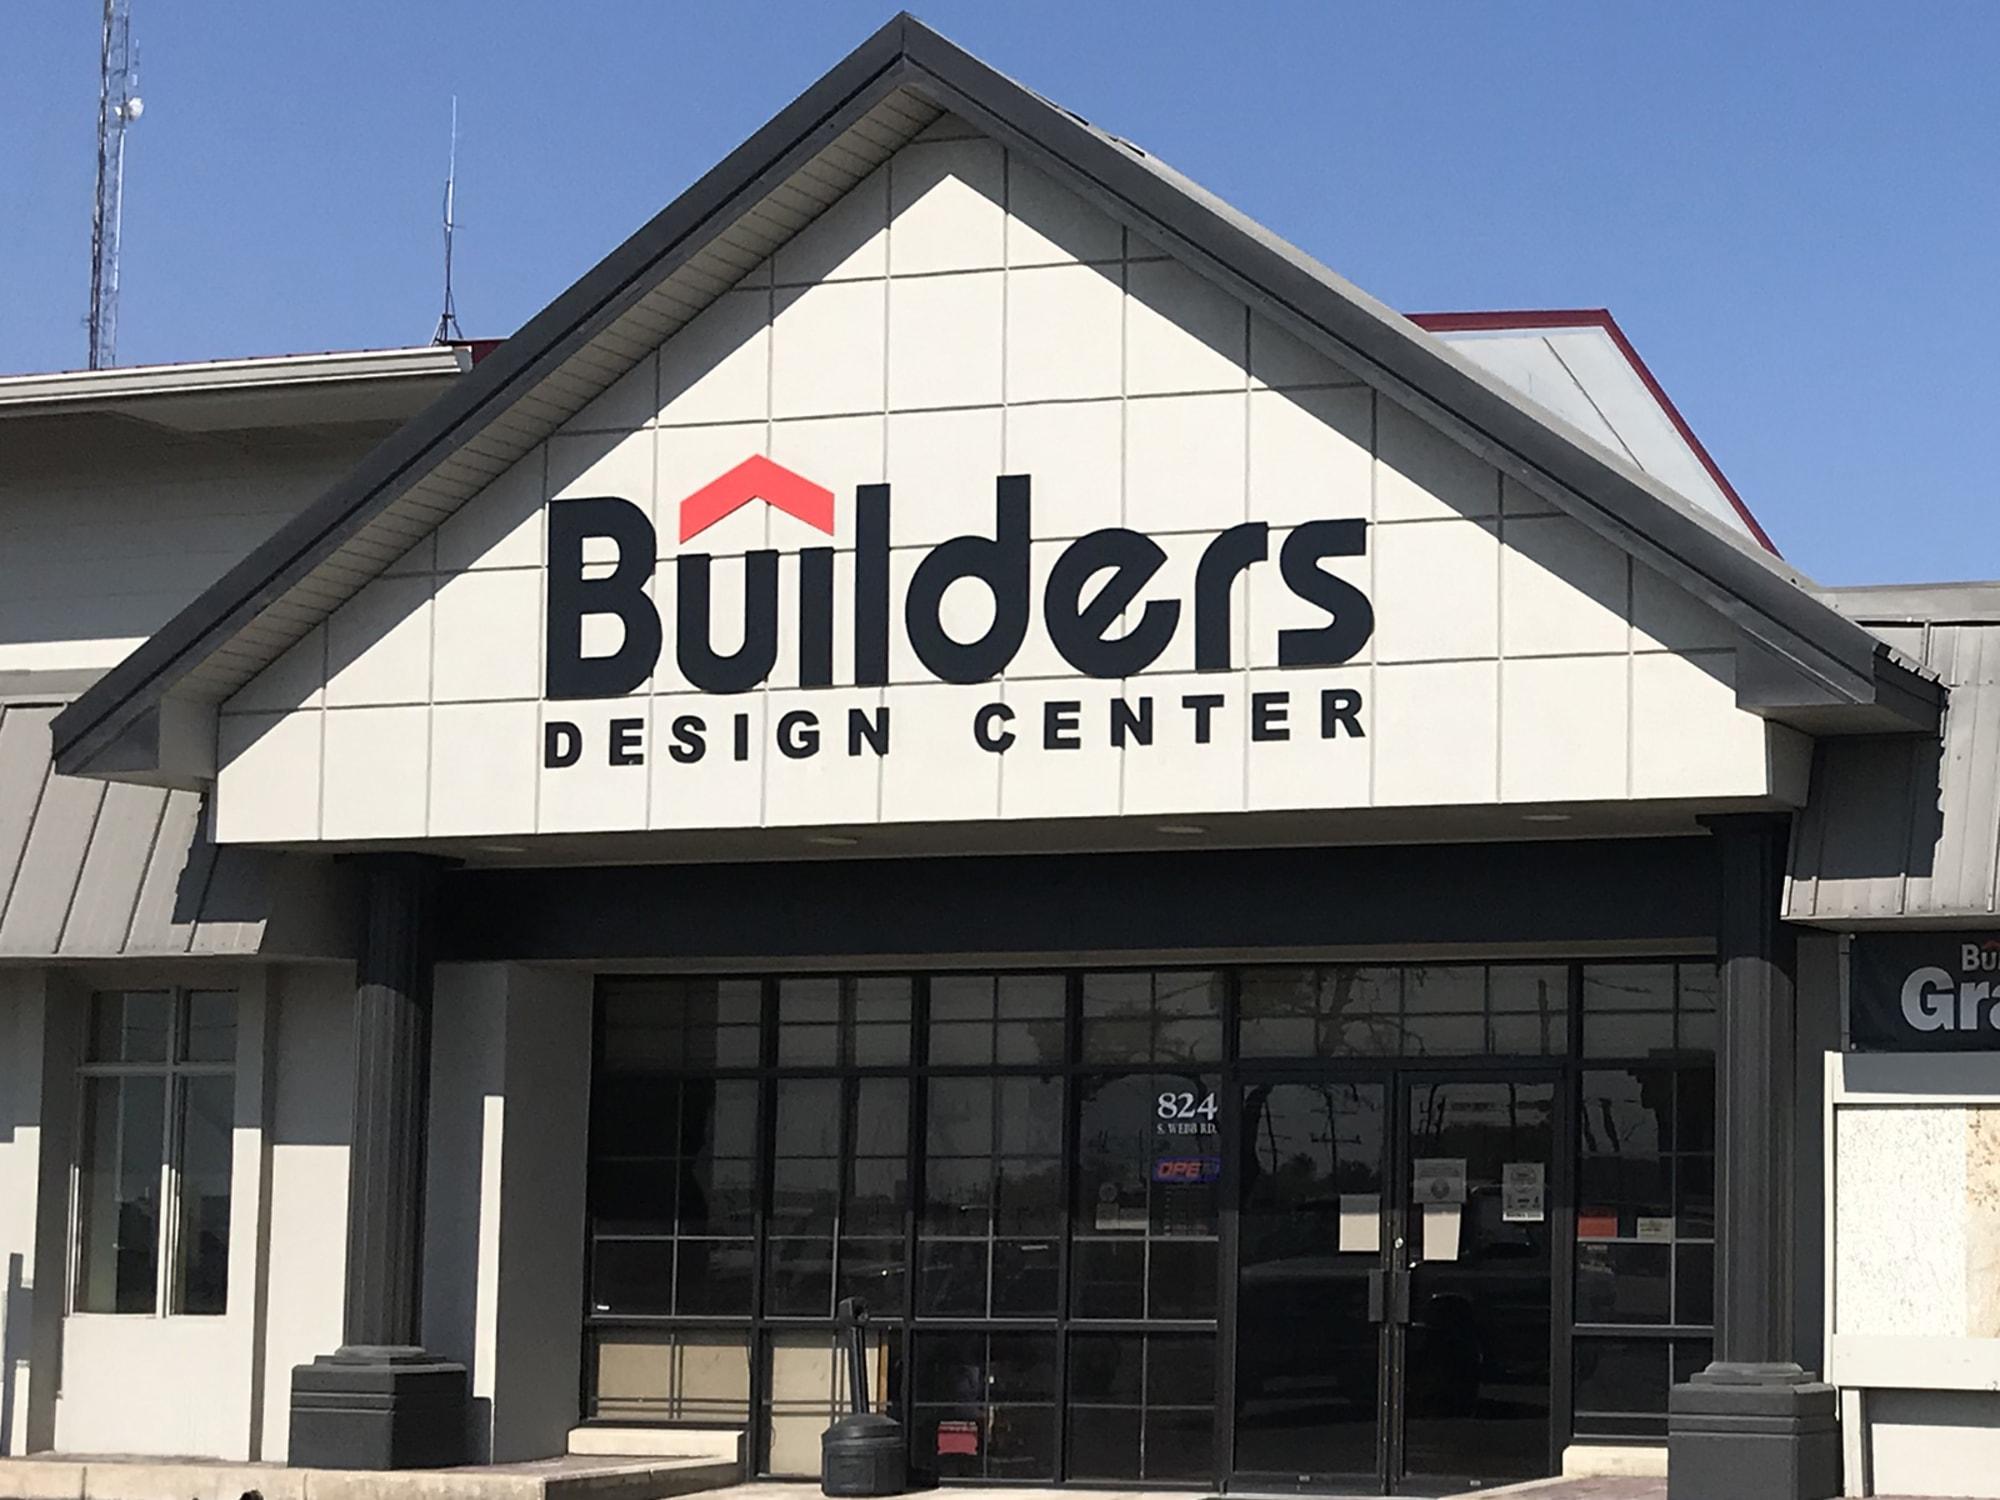 Builders Warehouse - 824 S Webb Rd Grand Island, NE 68803